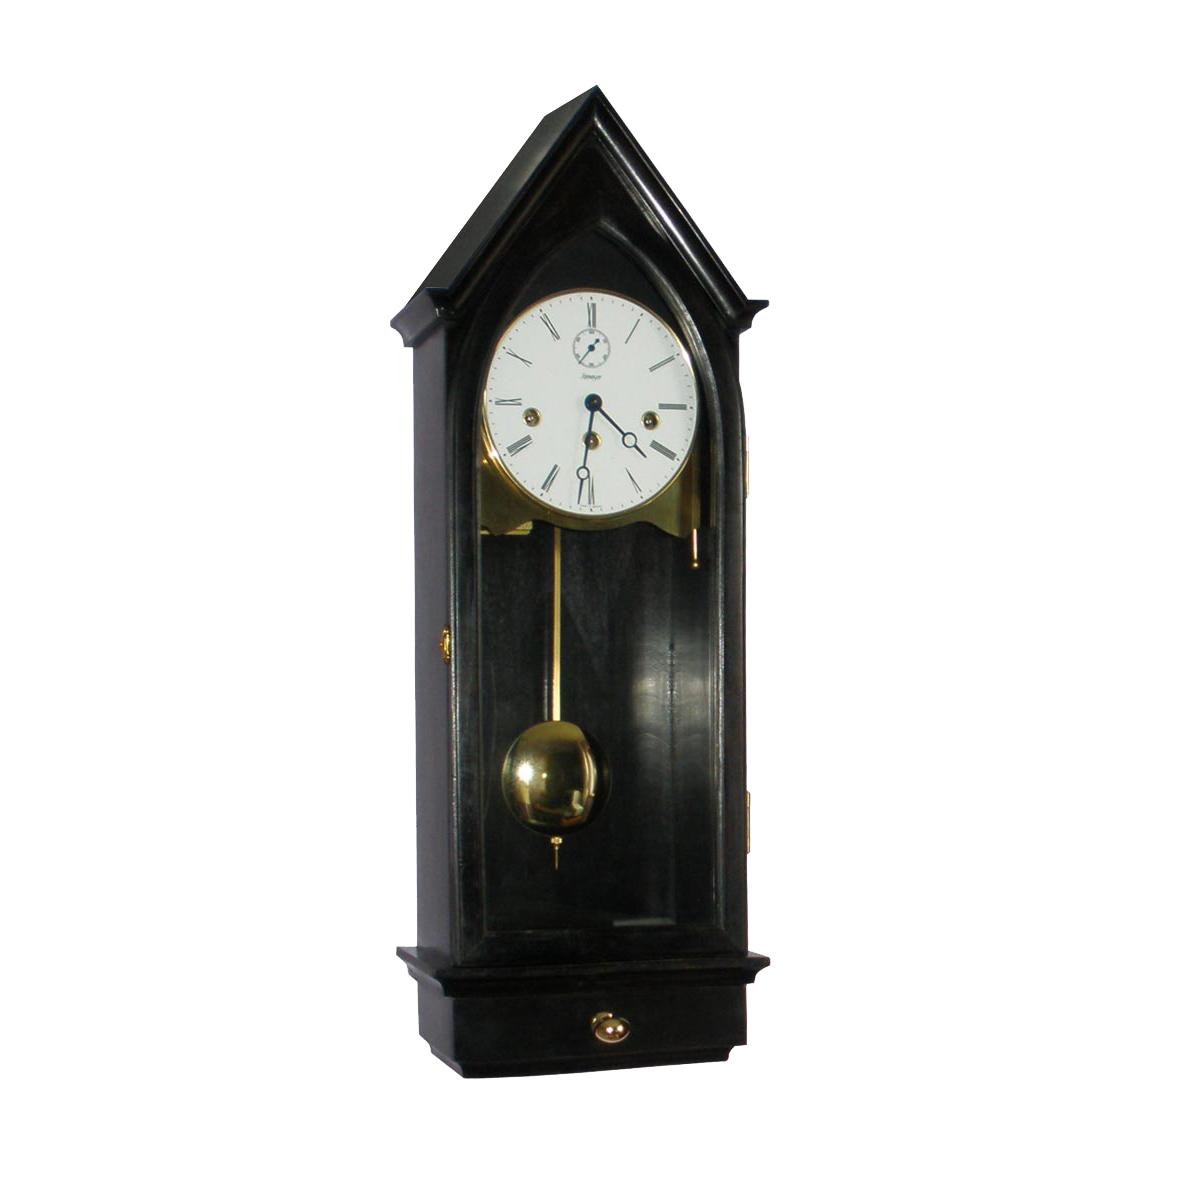 MURKIRK-EBONY Regulator Wall Clock